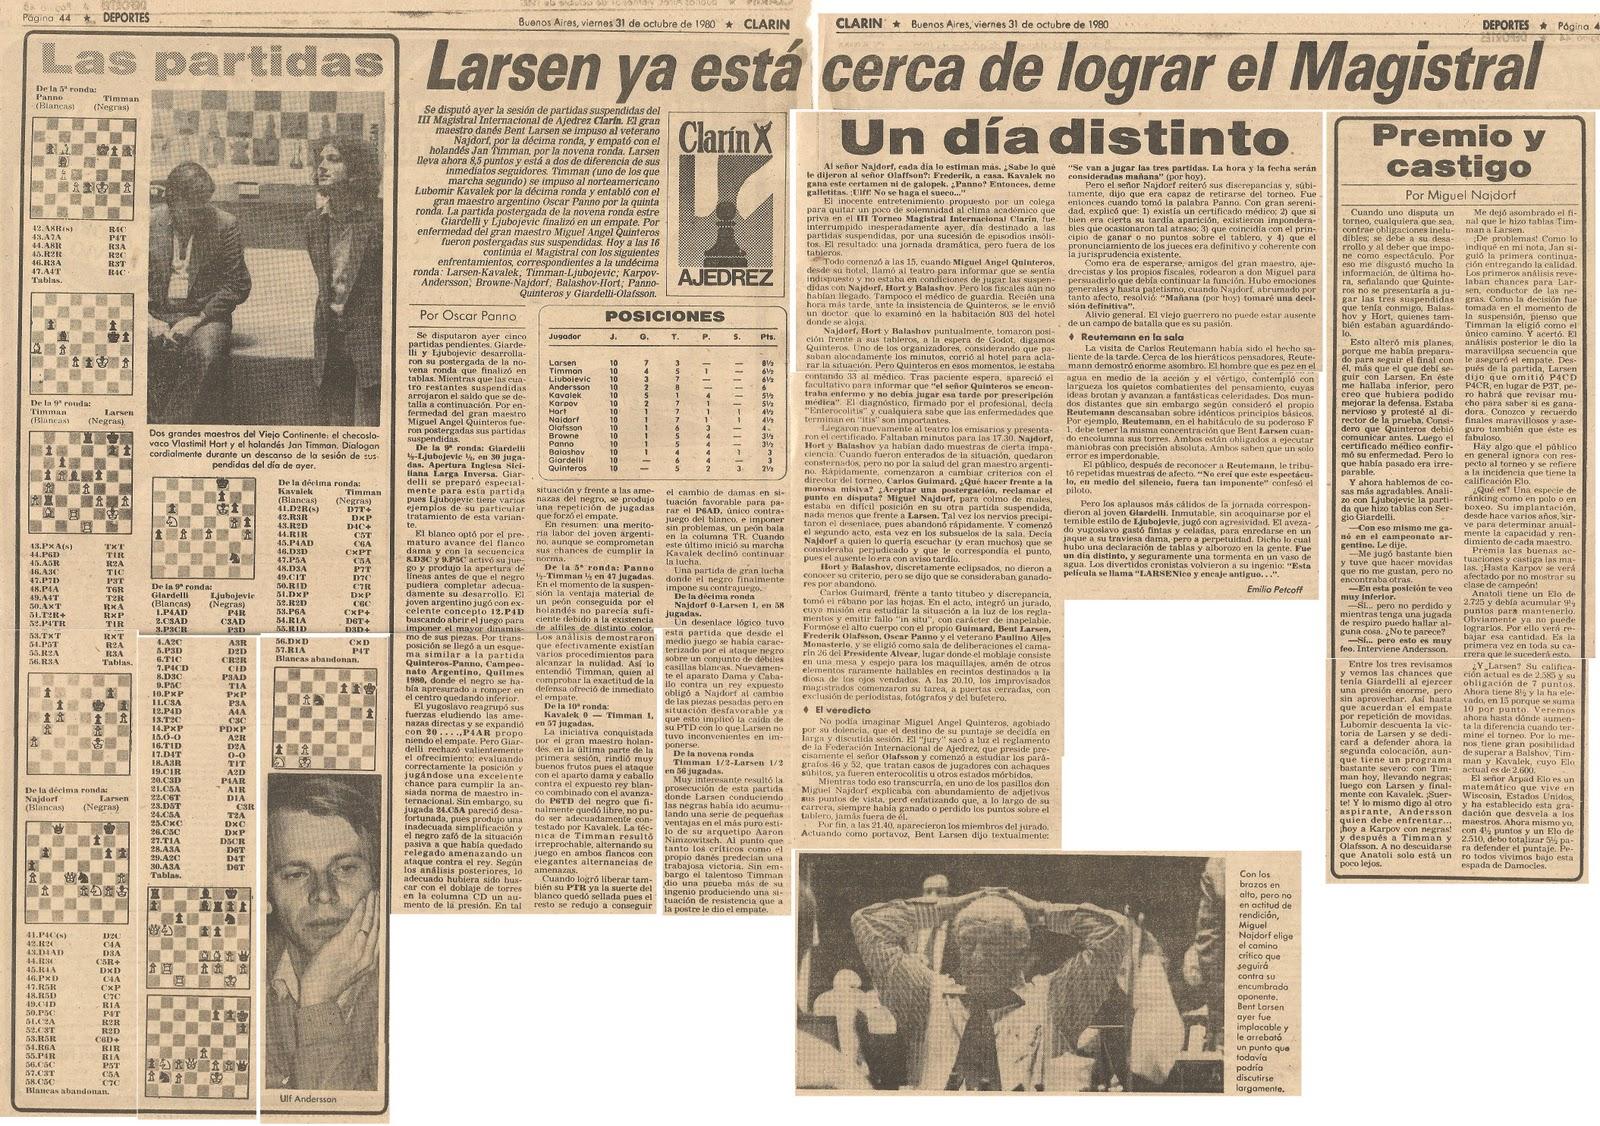 25 octubre 1980: